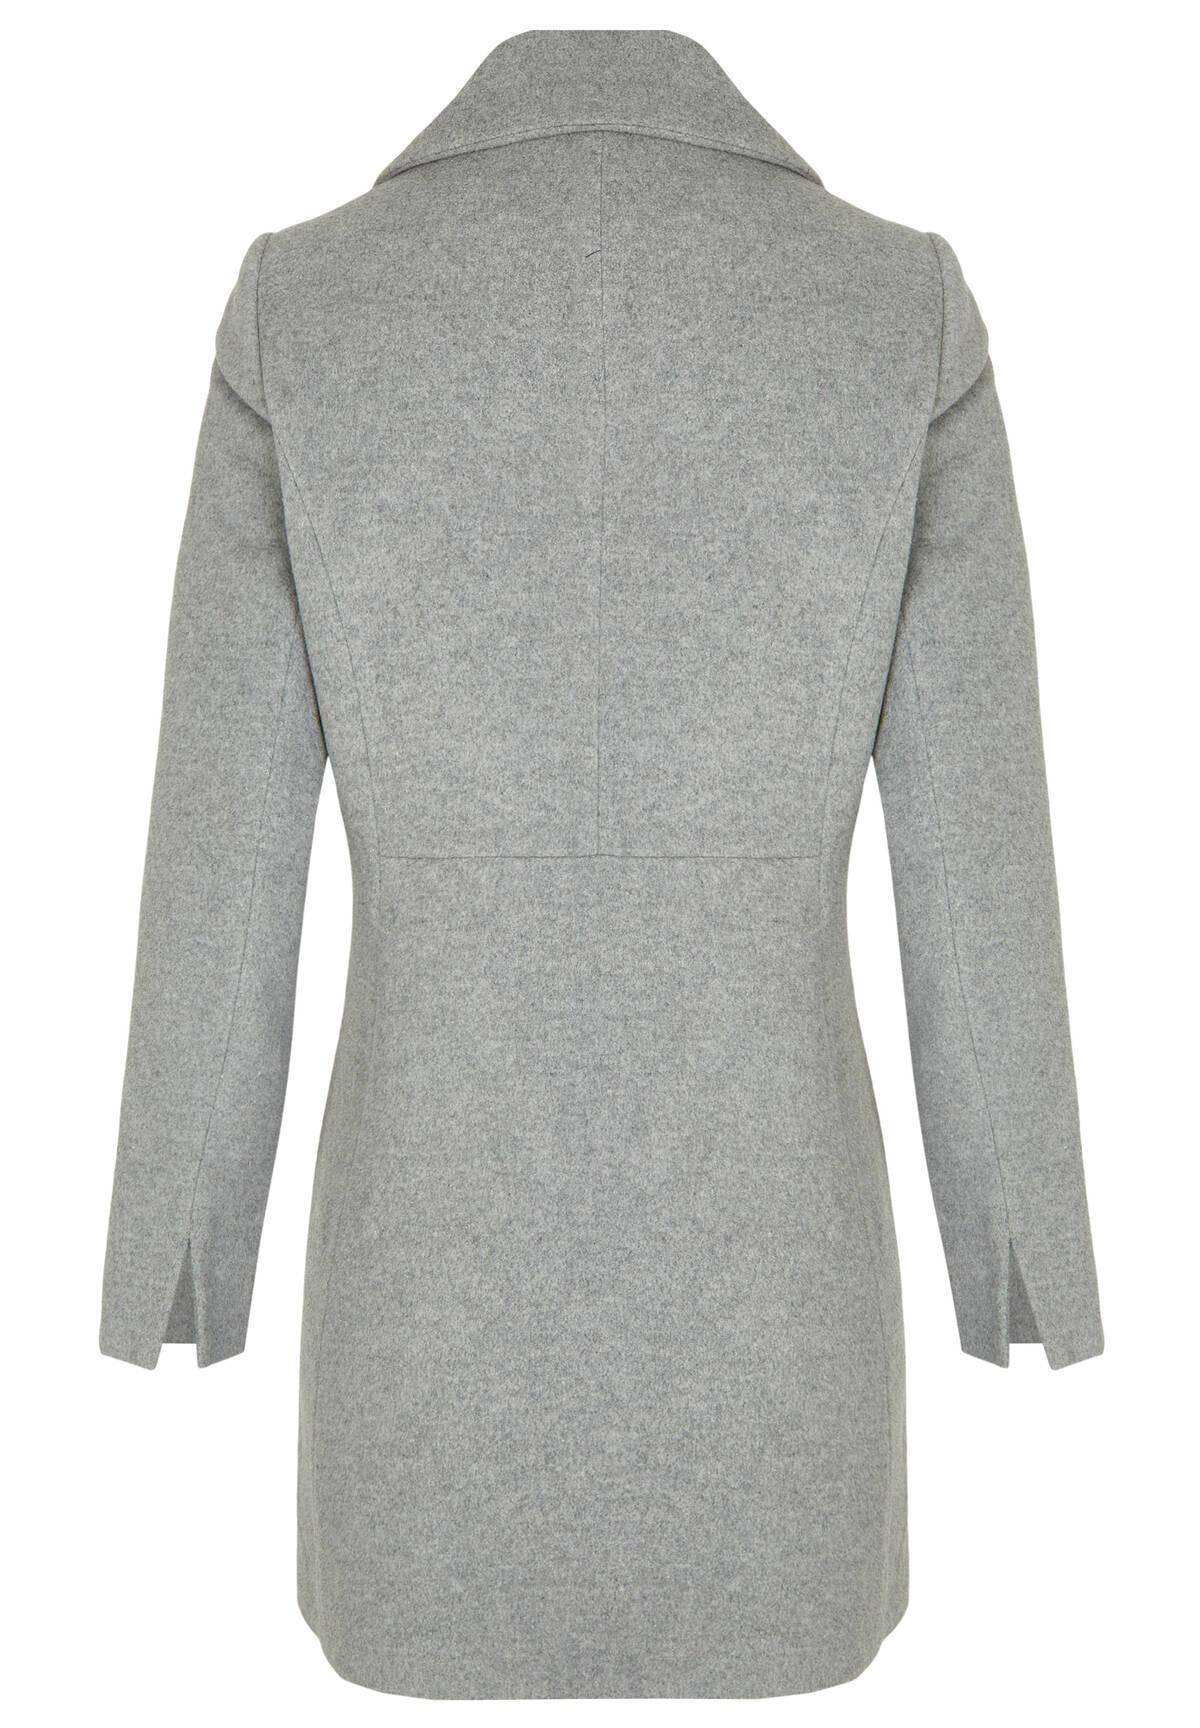 Manteau 3/4, col chemise /